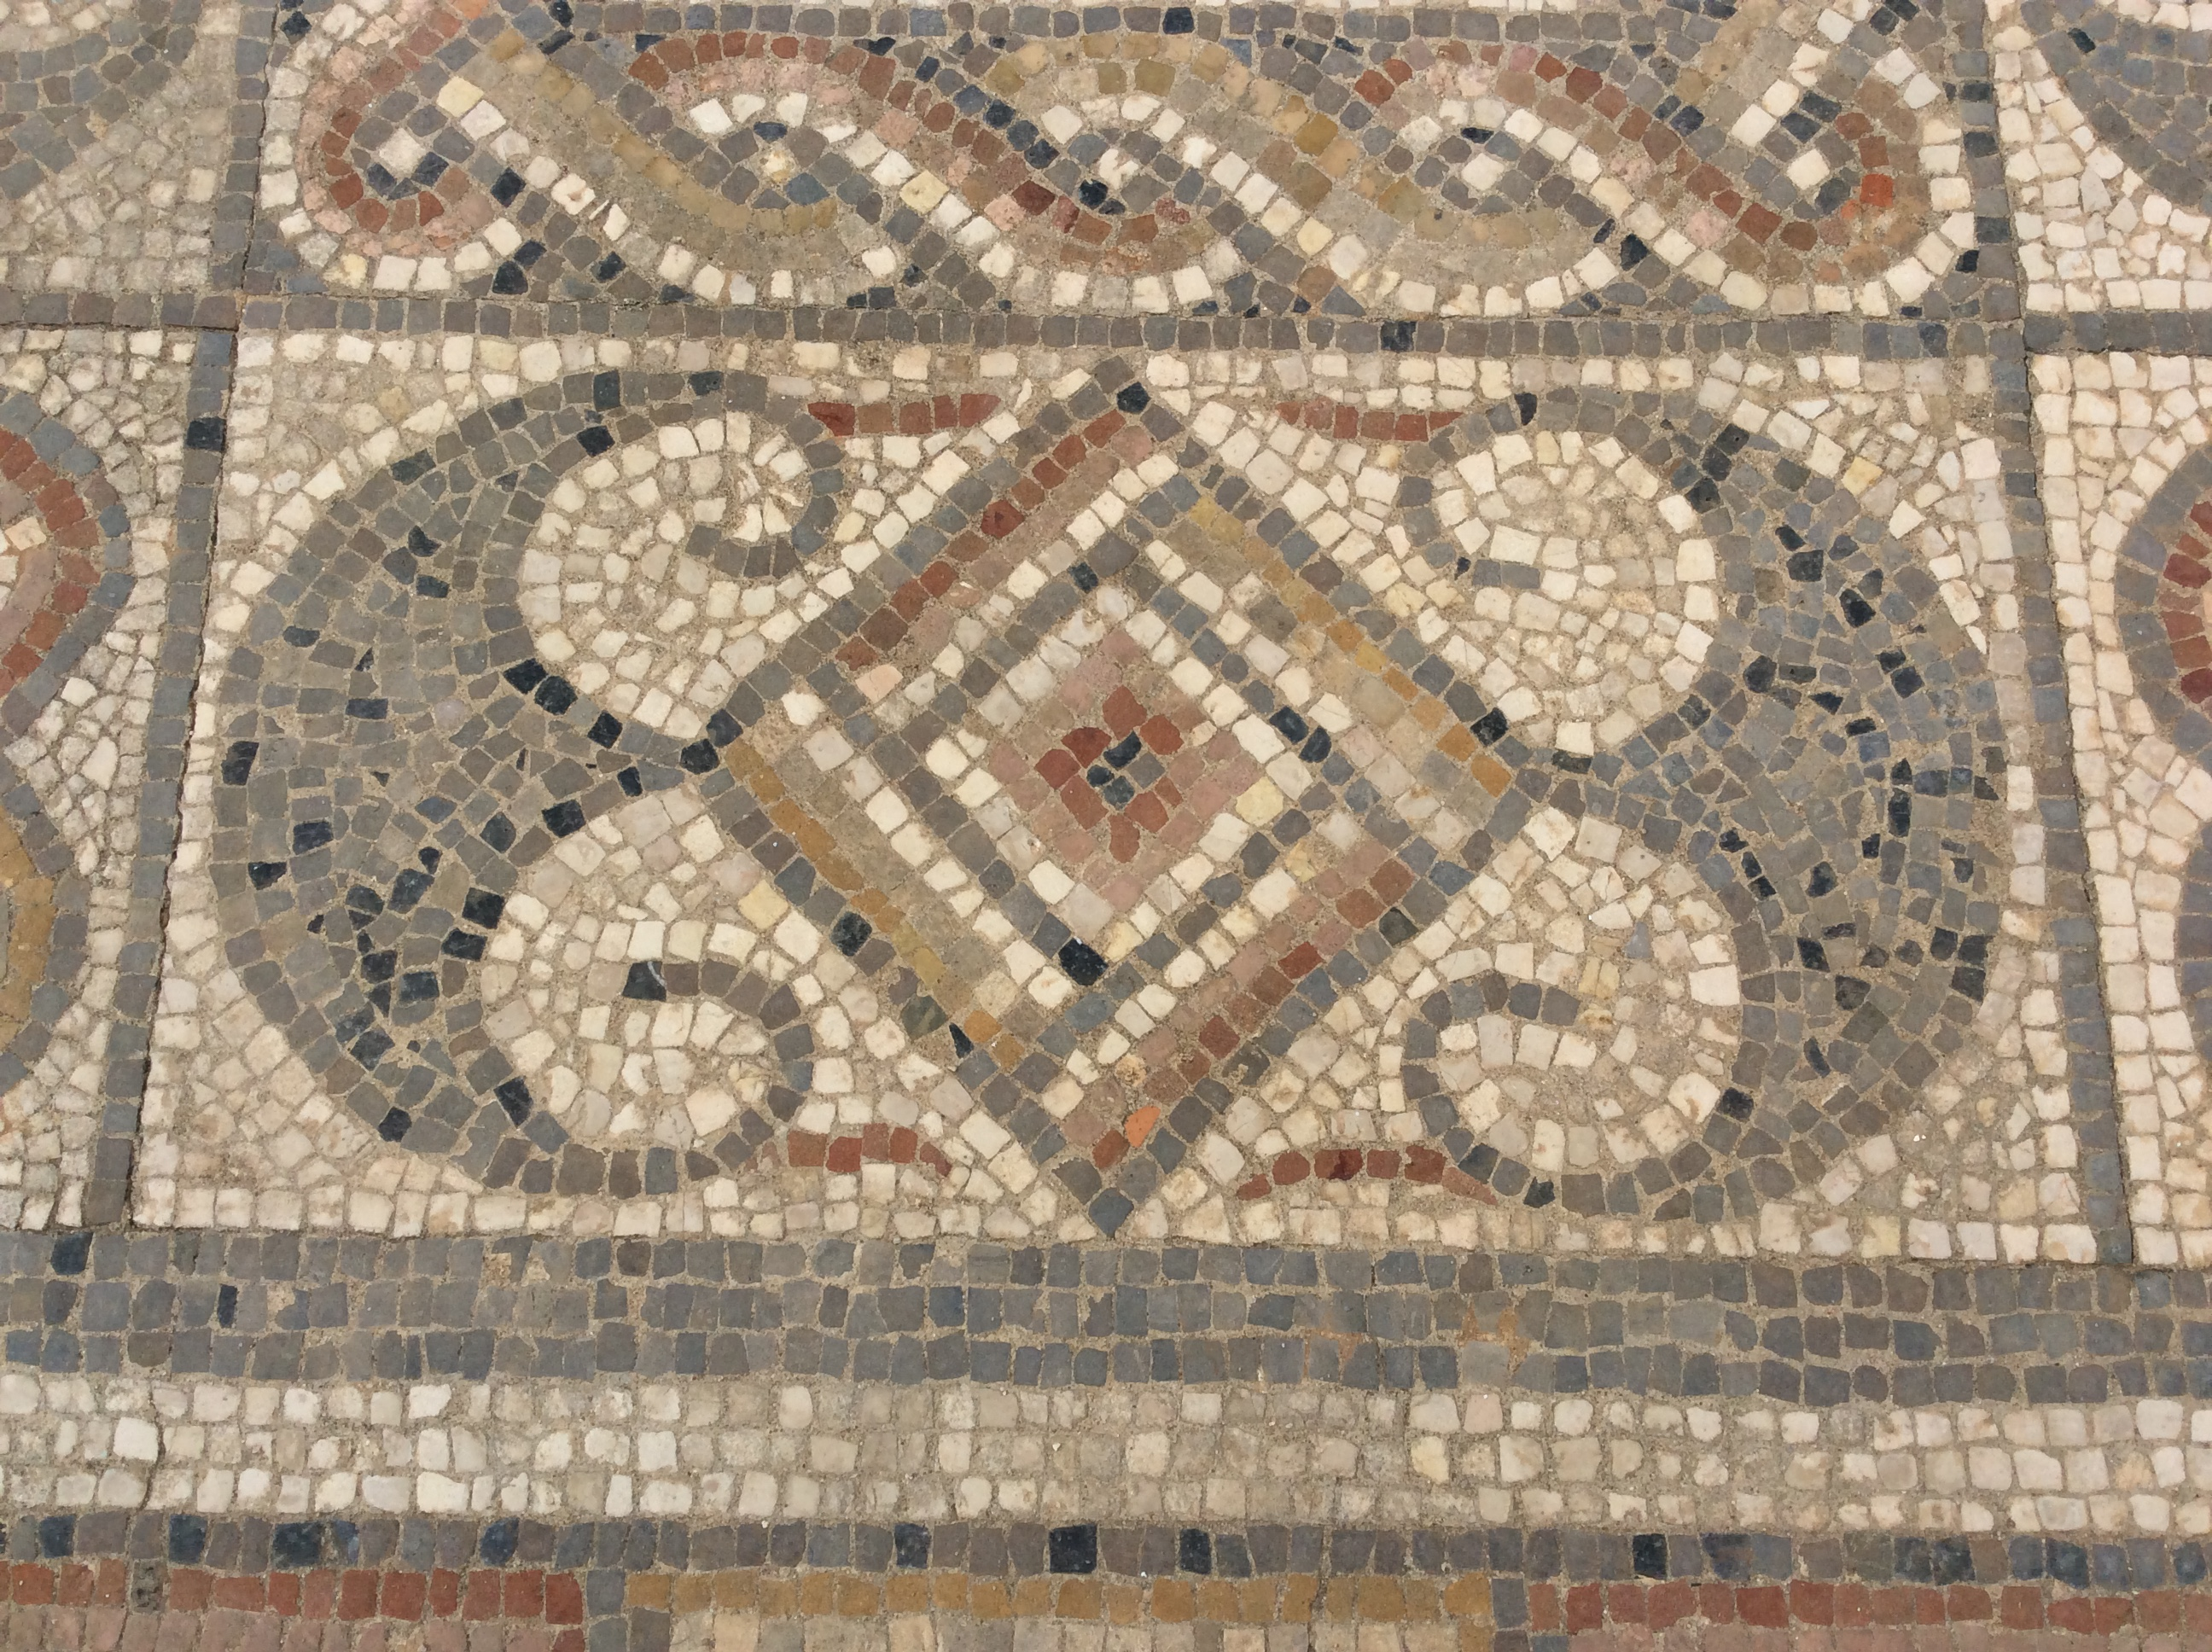 Mosaic_floor__Volubilis__Morocco.JPG